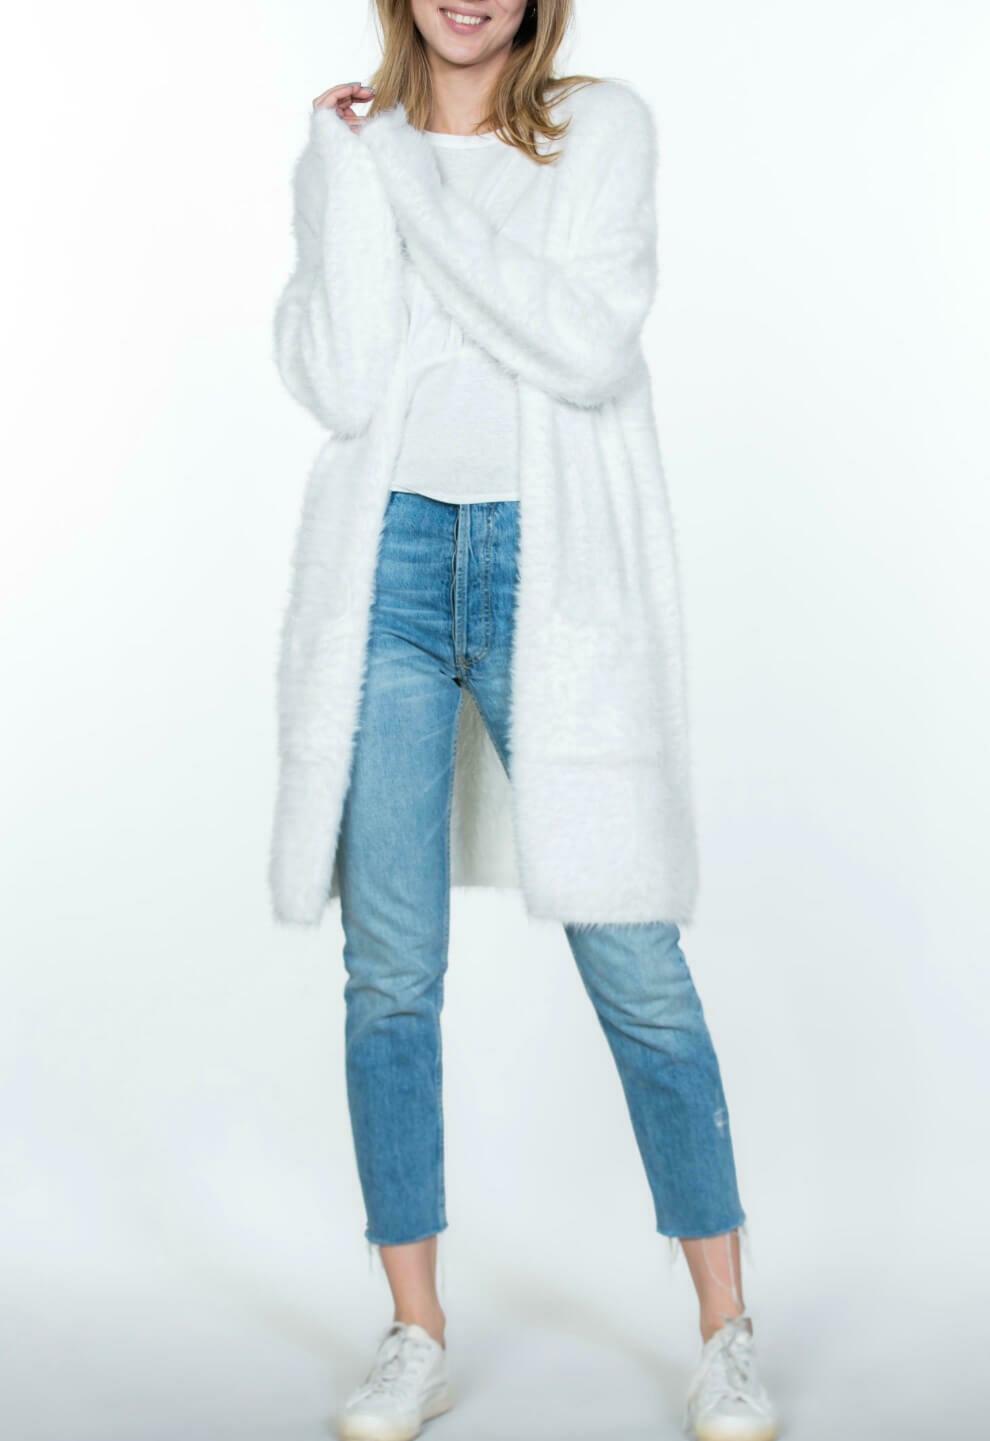 Long Fuzzy White Cardigan